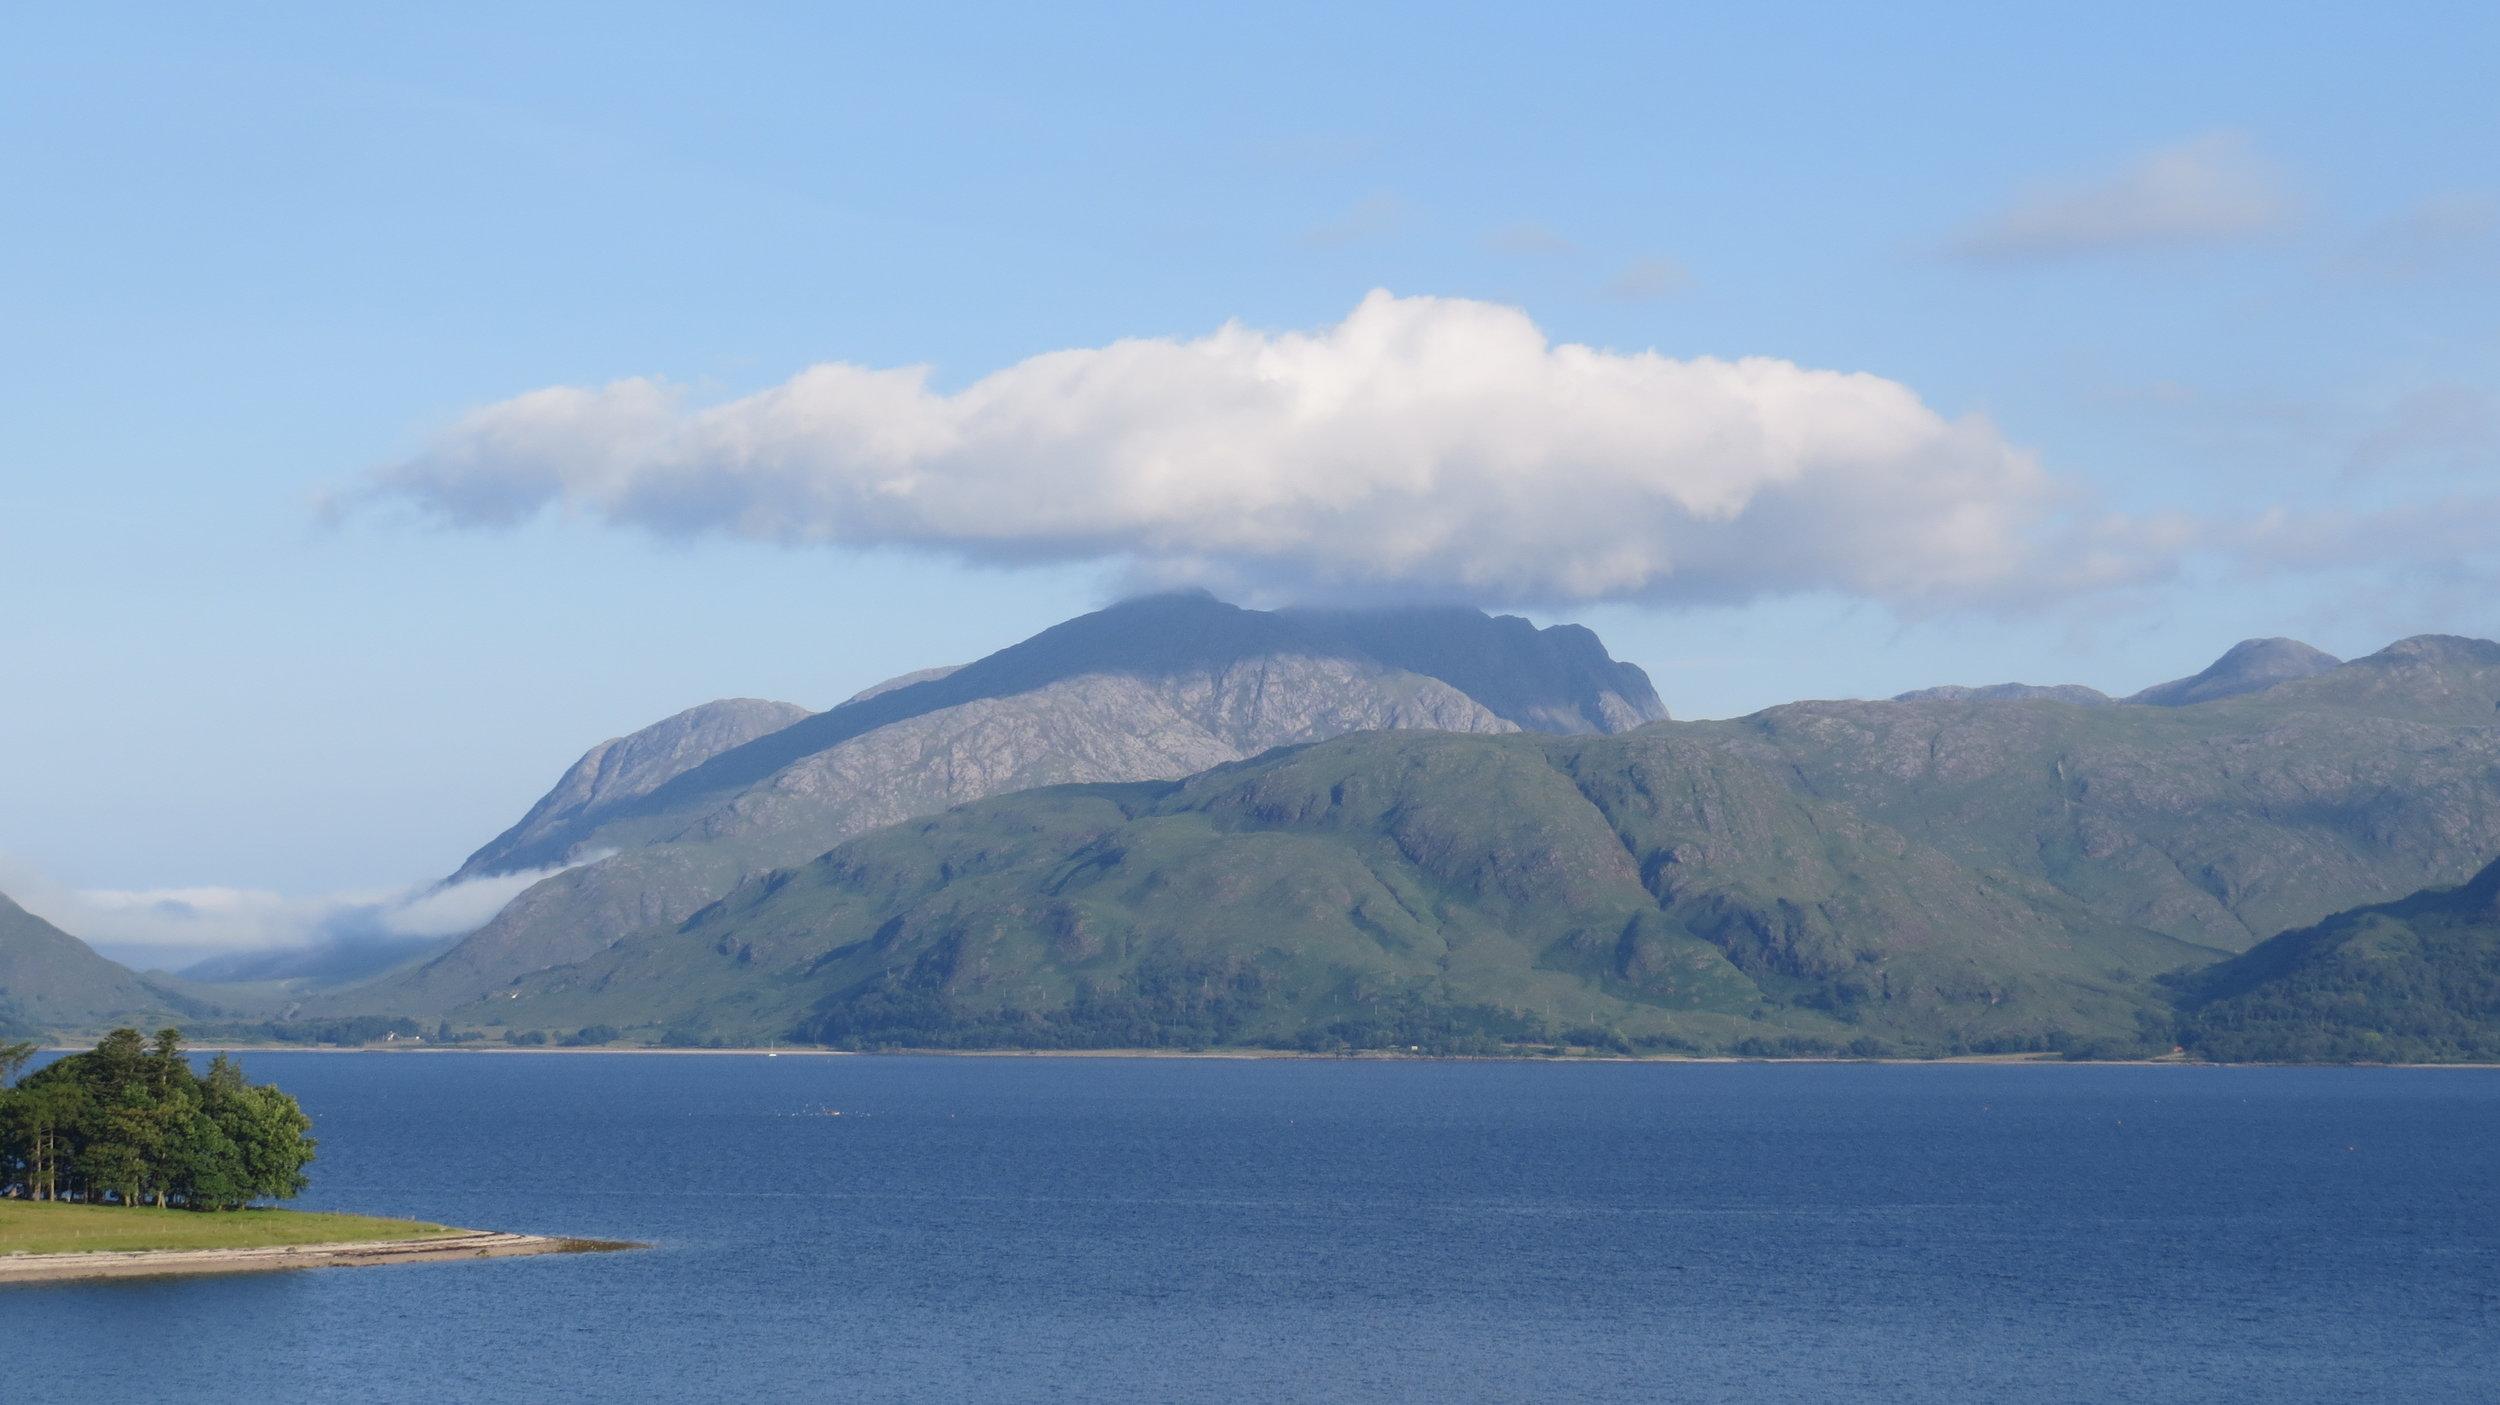 Cloud topped Mountain